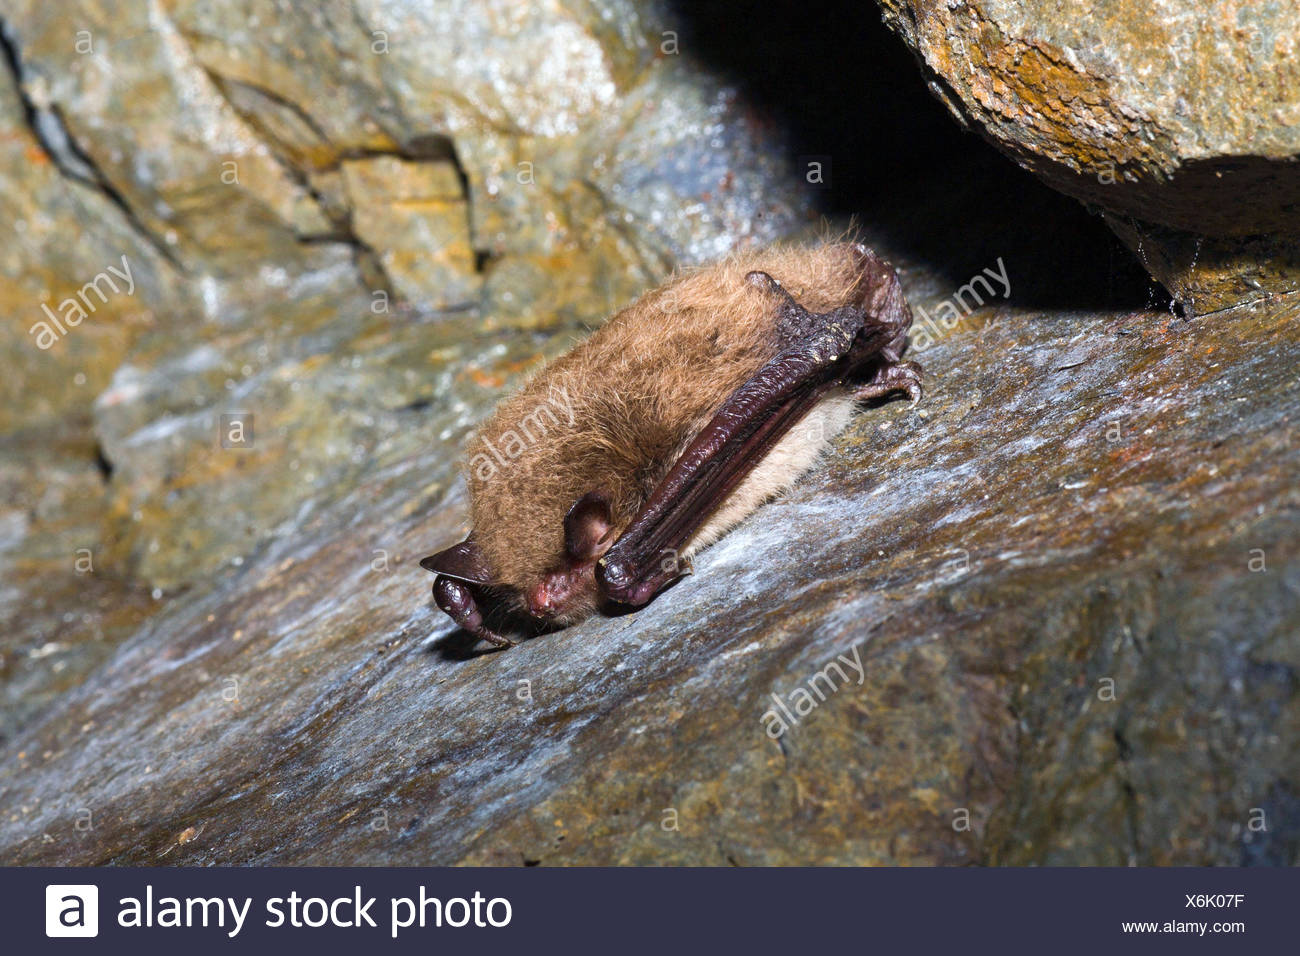 Daubenton's bat (Myotis daubentoni), hibernating at a rock wall, Germany, Lower Saxony - Stock Image